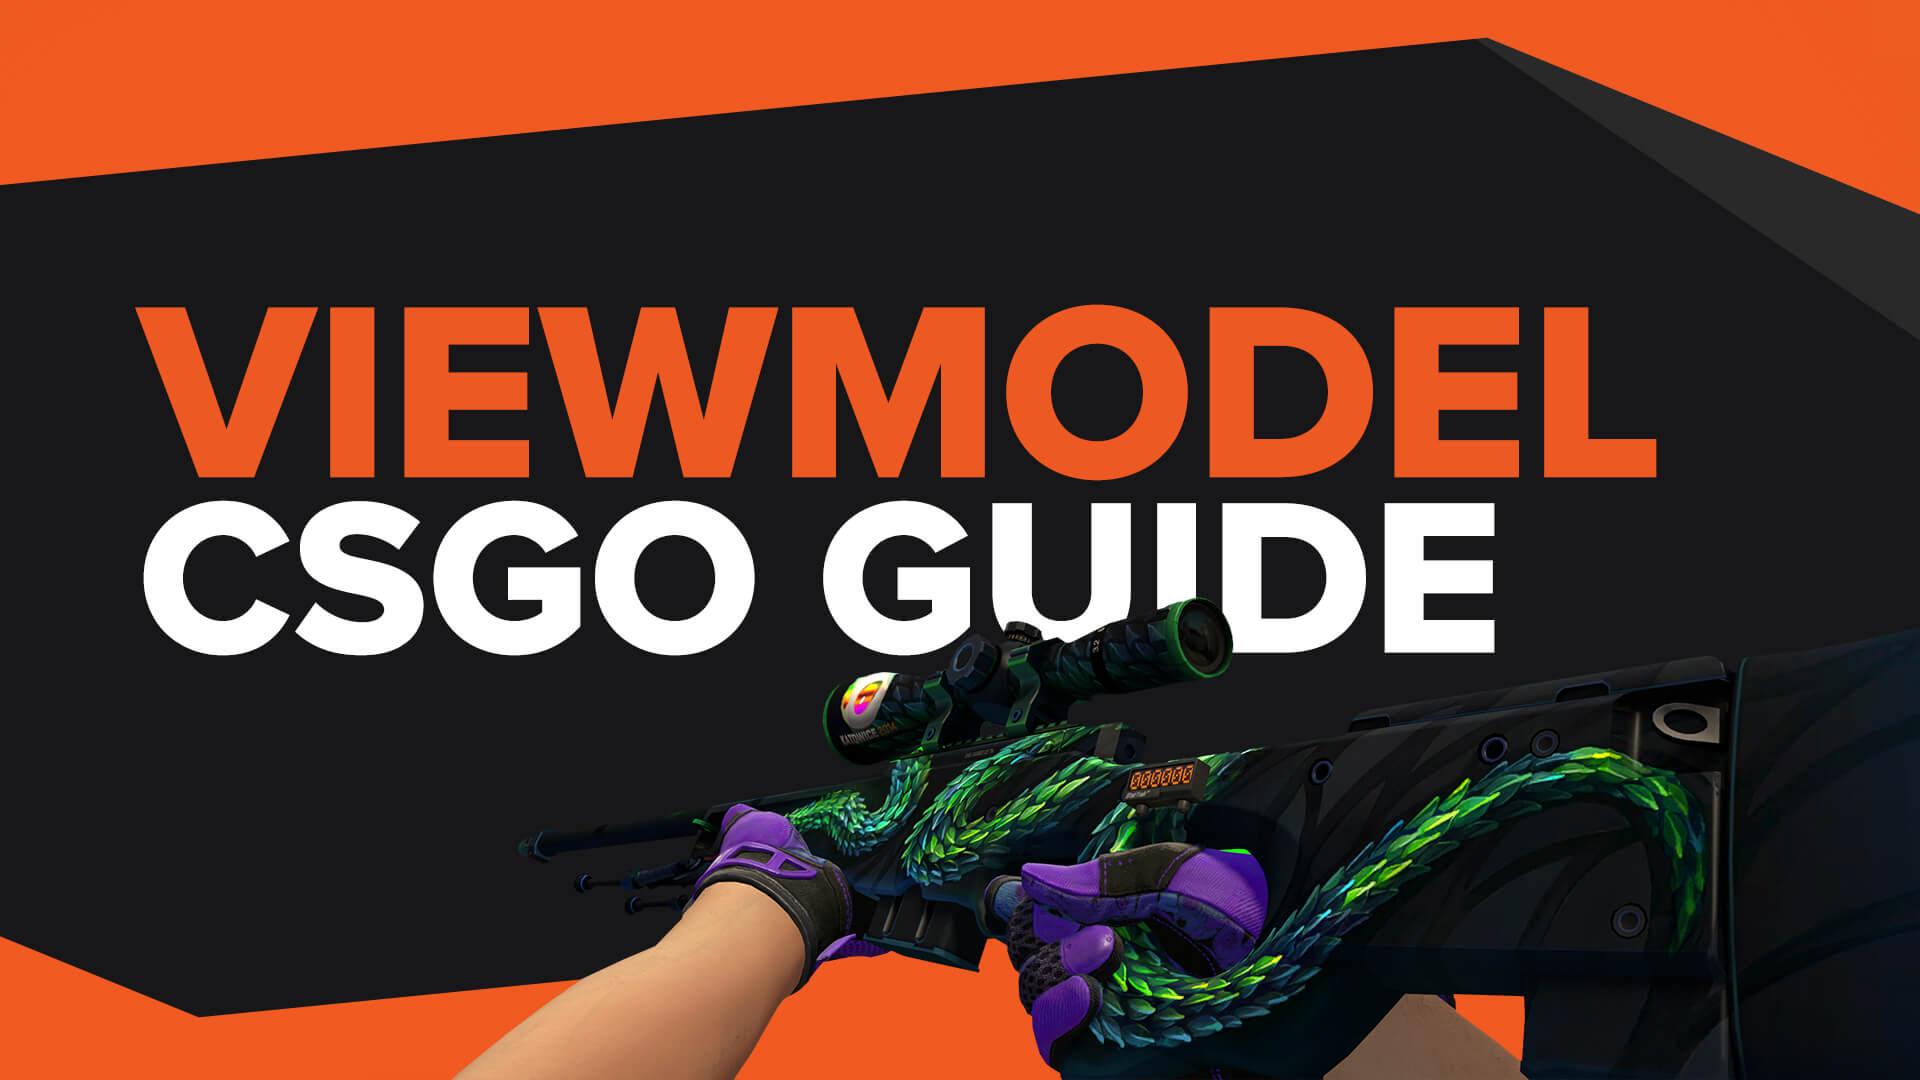 Ultimate CS:GO Viewmodel Guide